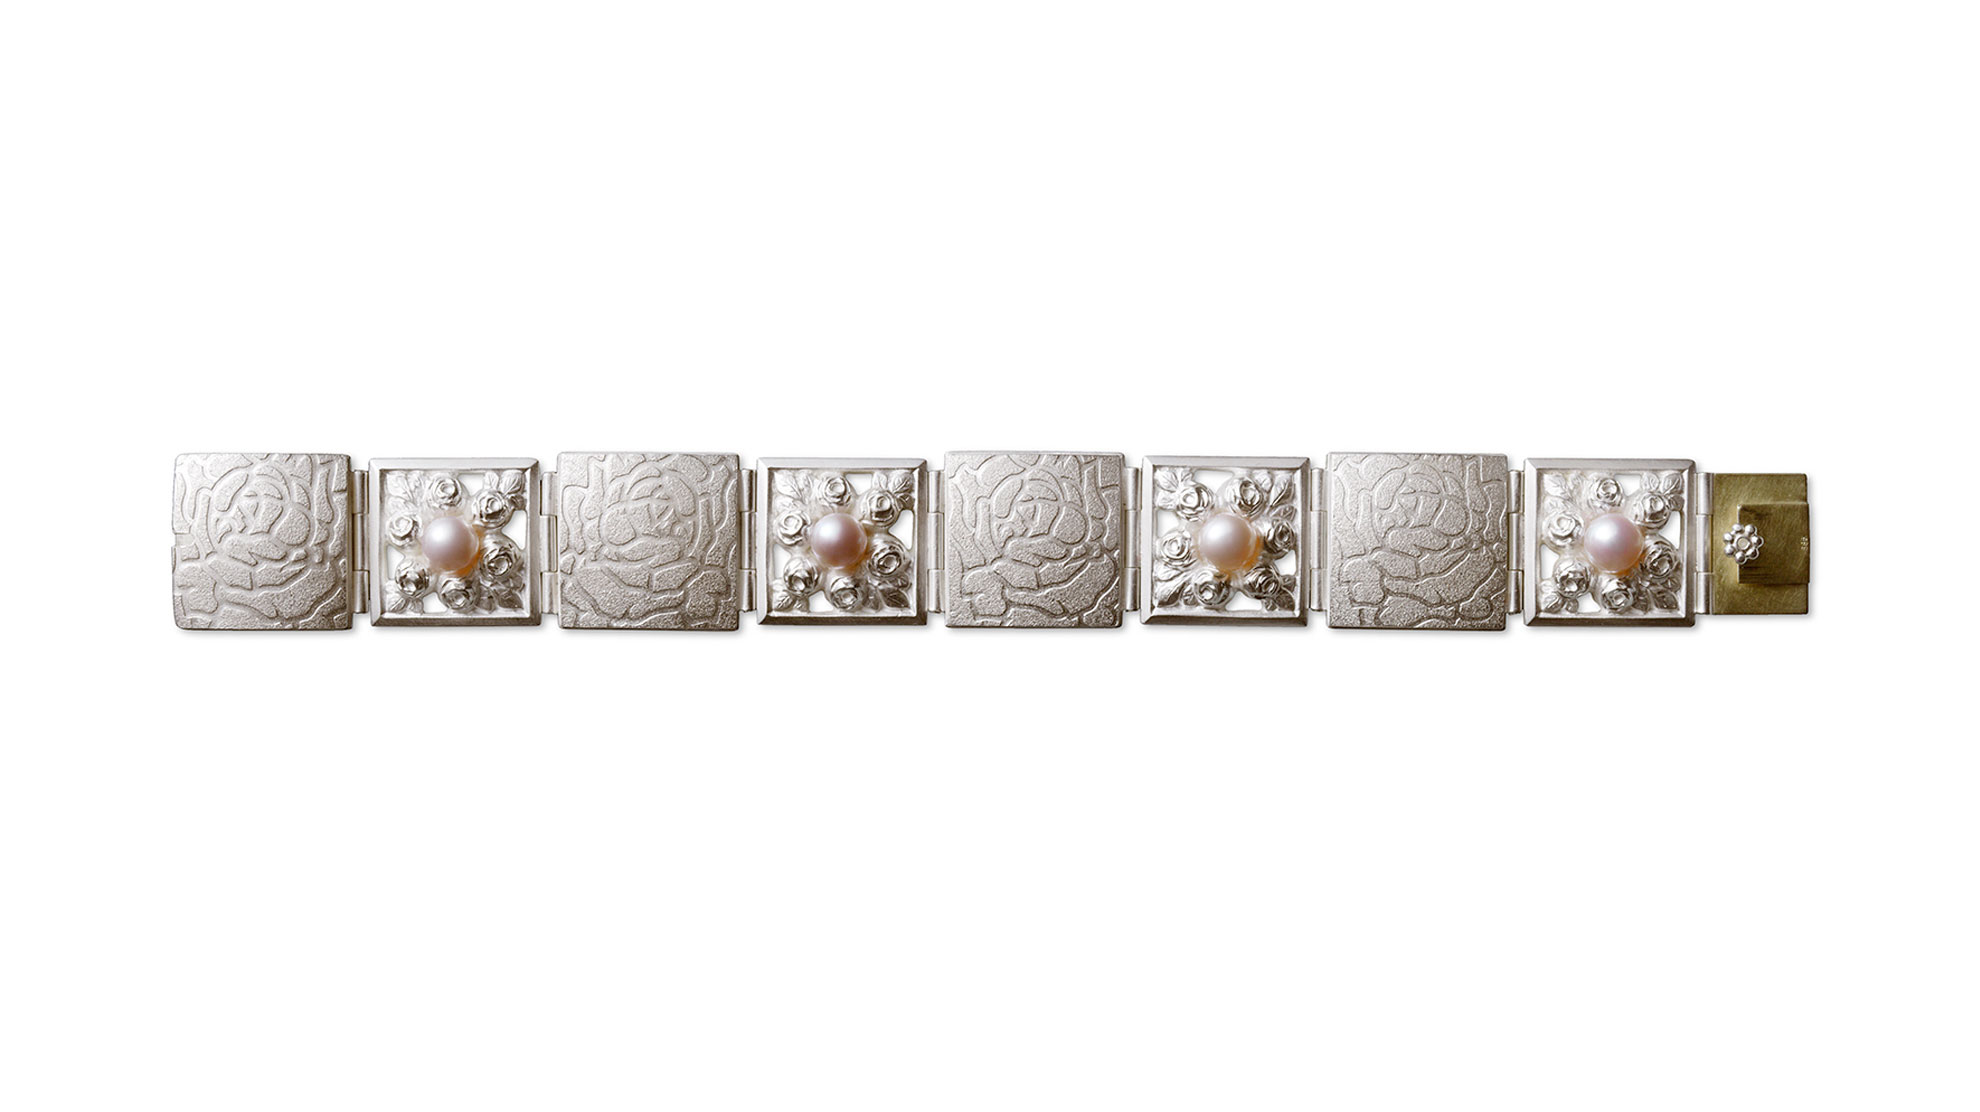 02 Armband Rosen 925 Silber 585 Gelbgold Zuchtperlen